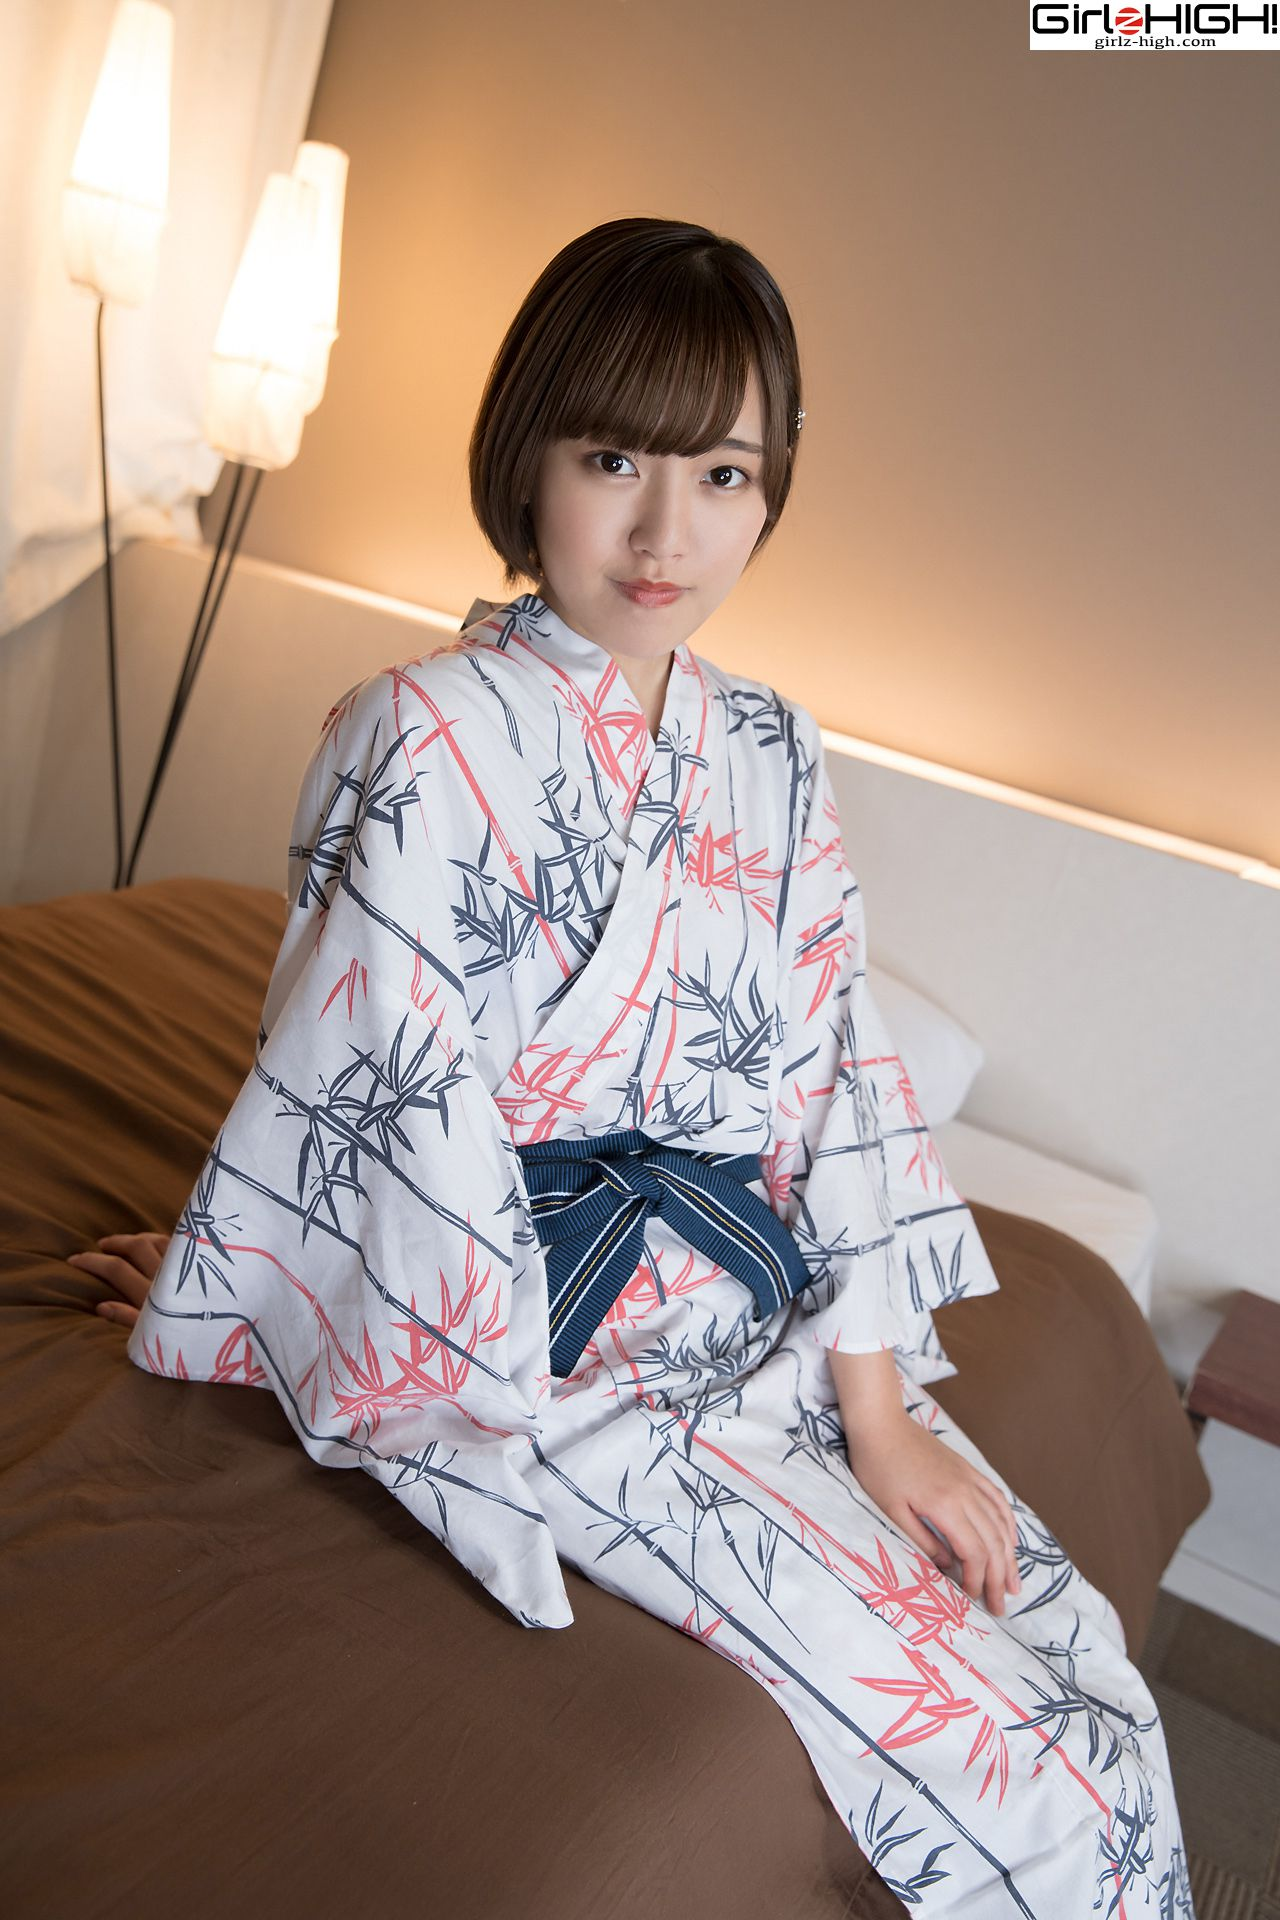 VOL.682 [Girlz-High]和服:香月杏珠(香月りお)超高清写真套图(55P)